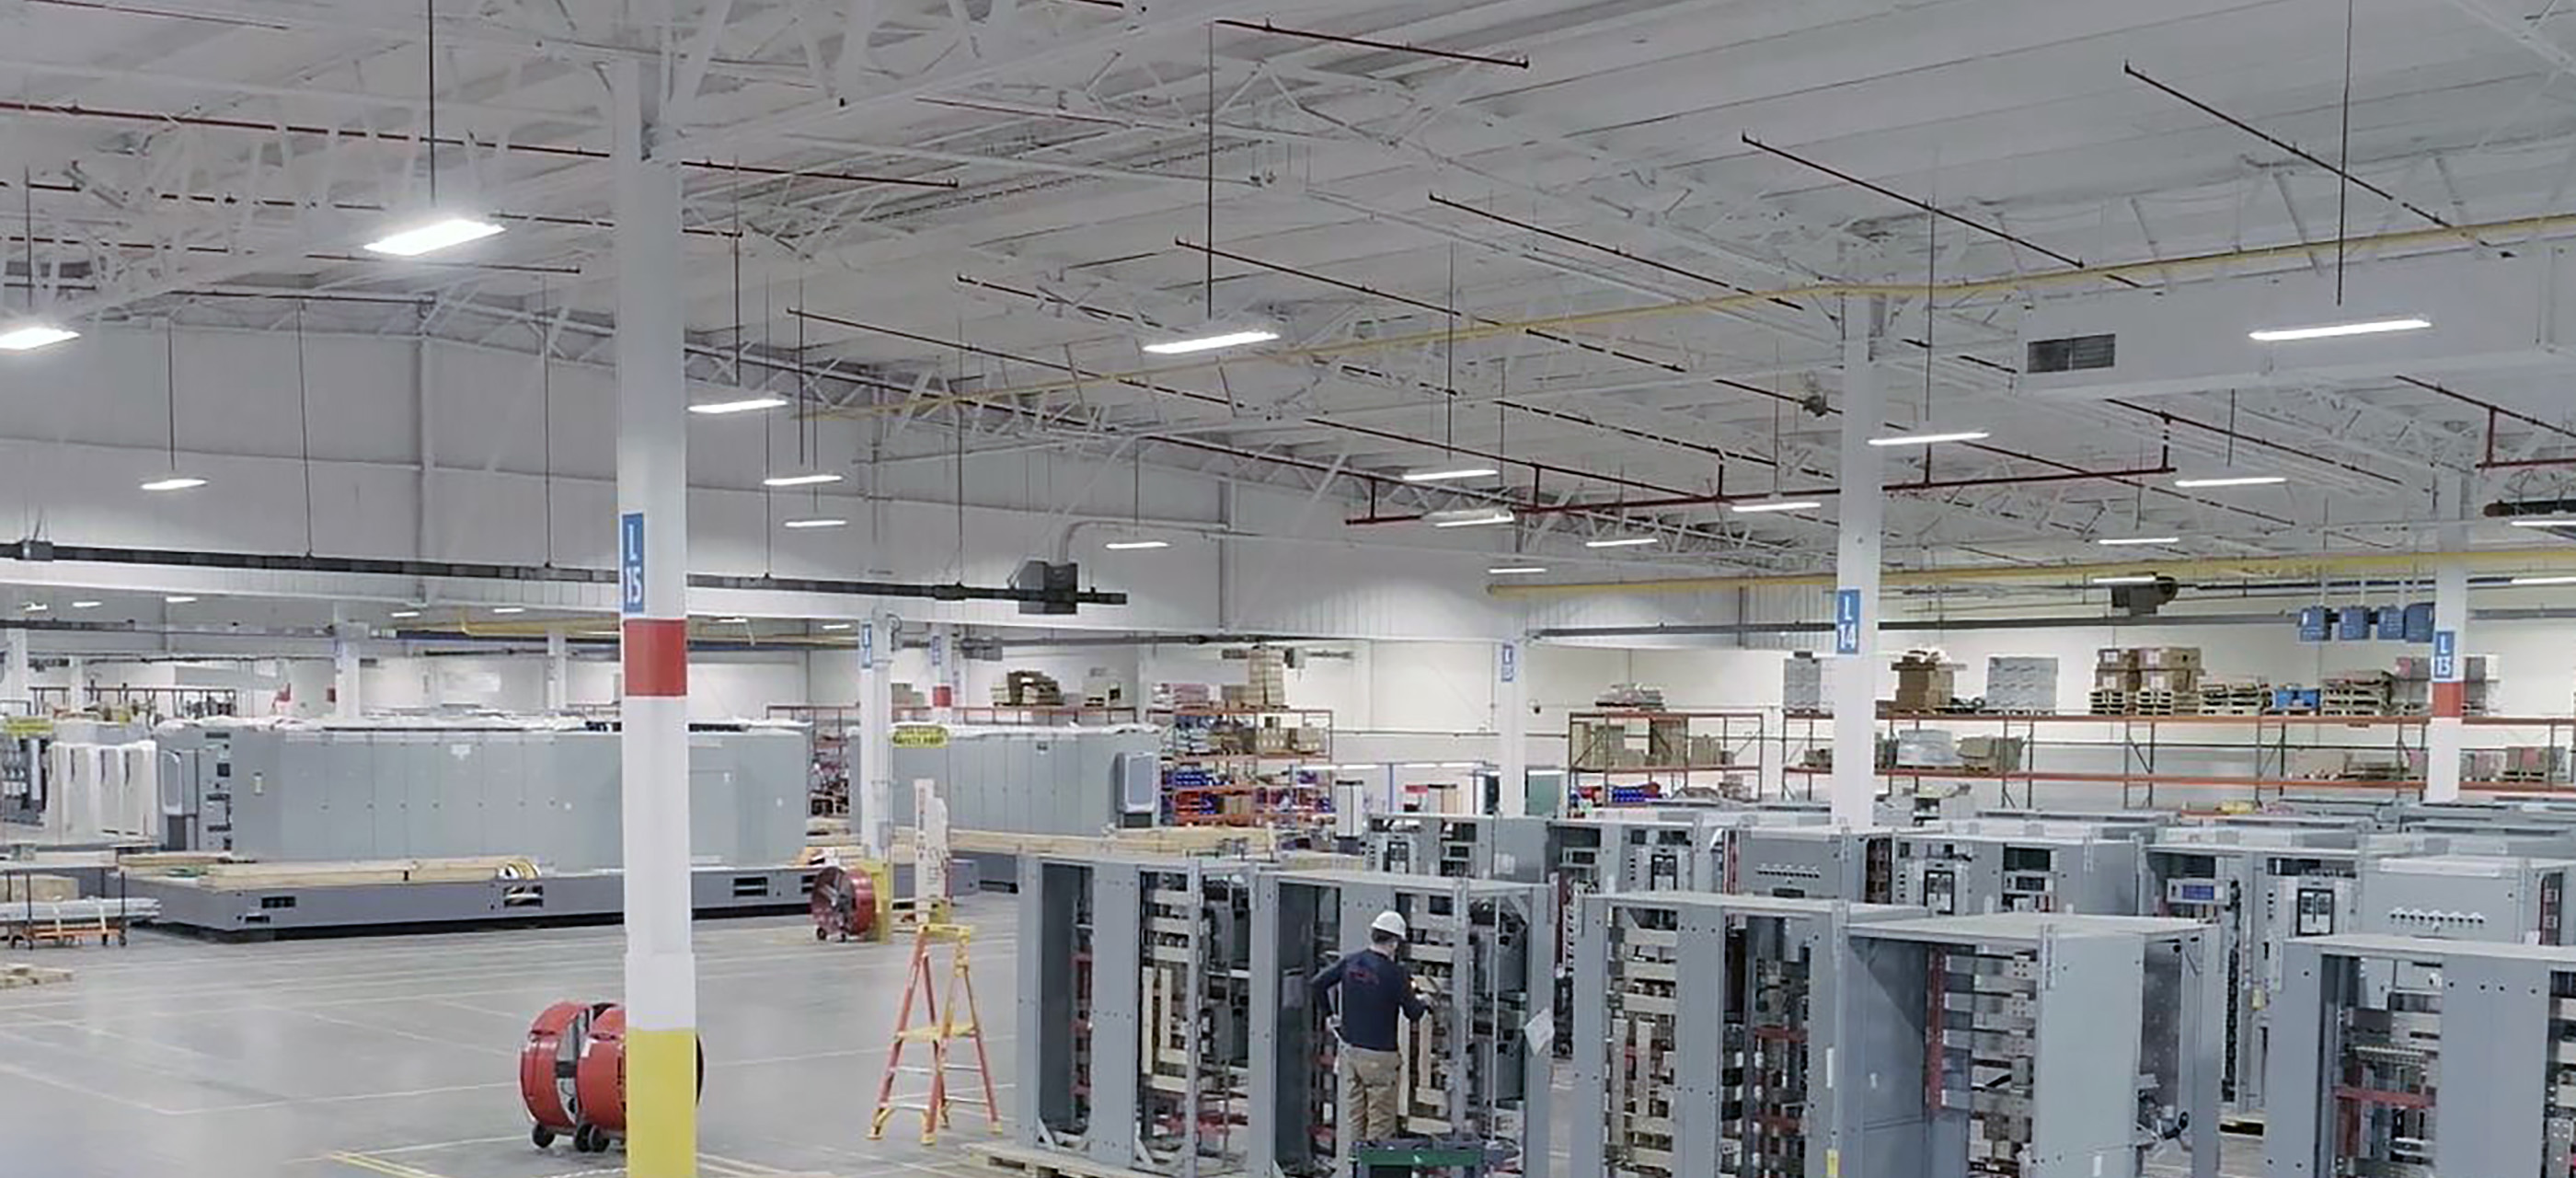 Prefabricated modular facility for data center solutions